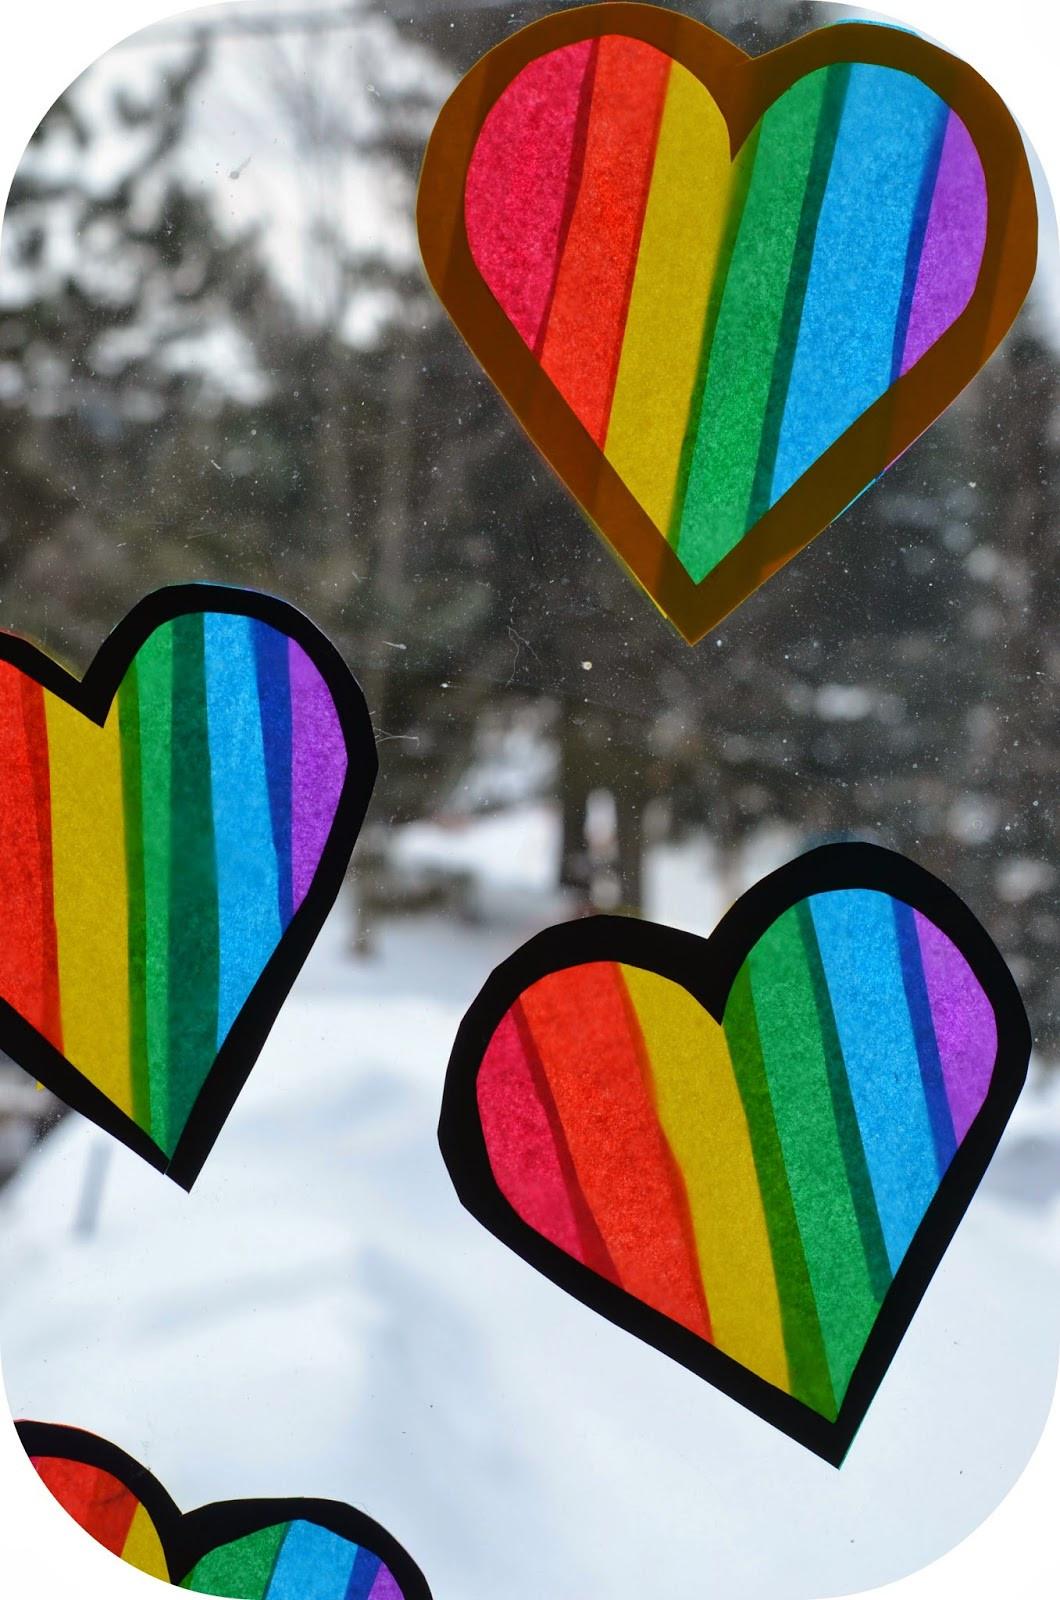 Rainbow Artwork For Preschoolers  Twig and Toadstool Rainbow Heart Transparencies